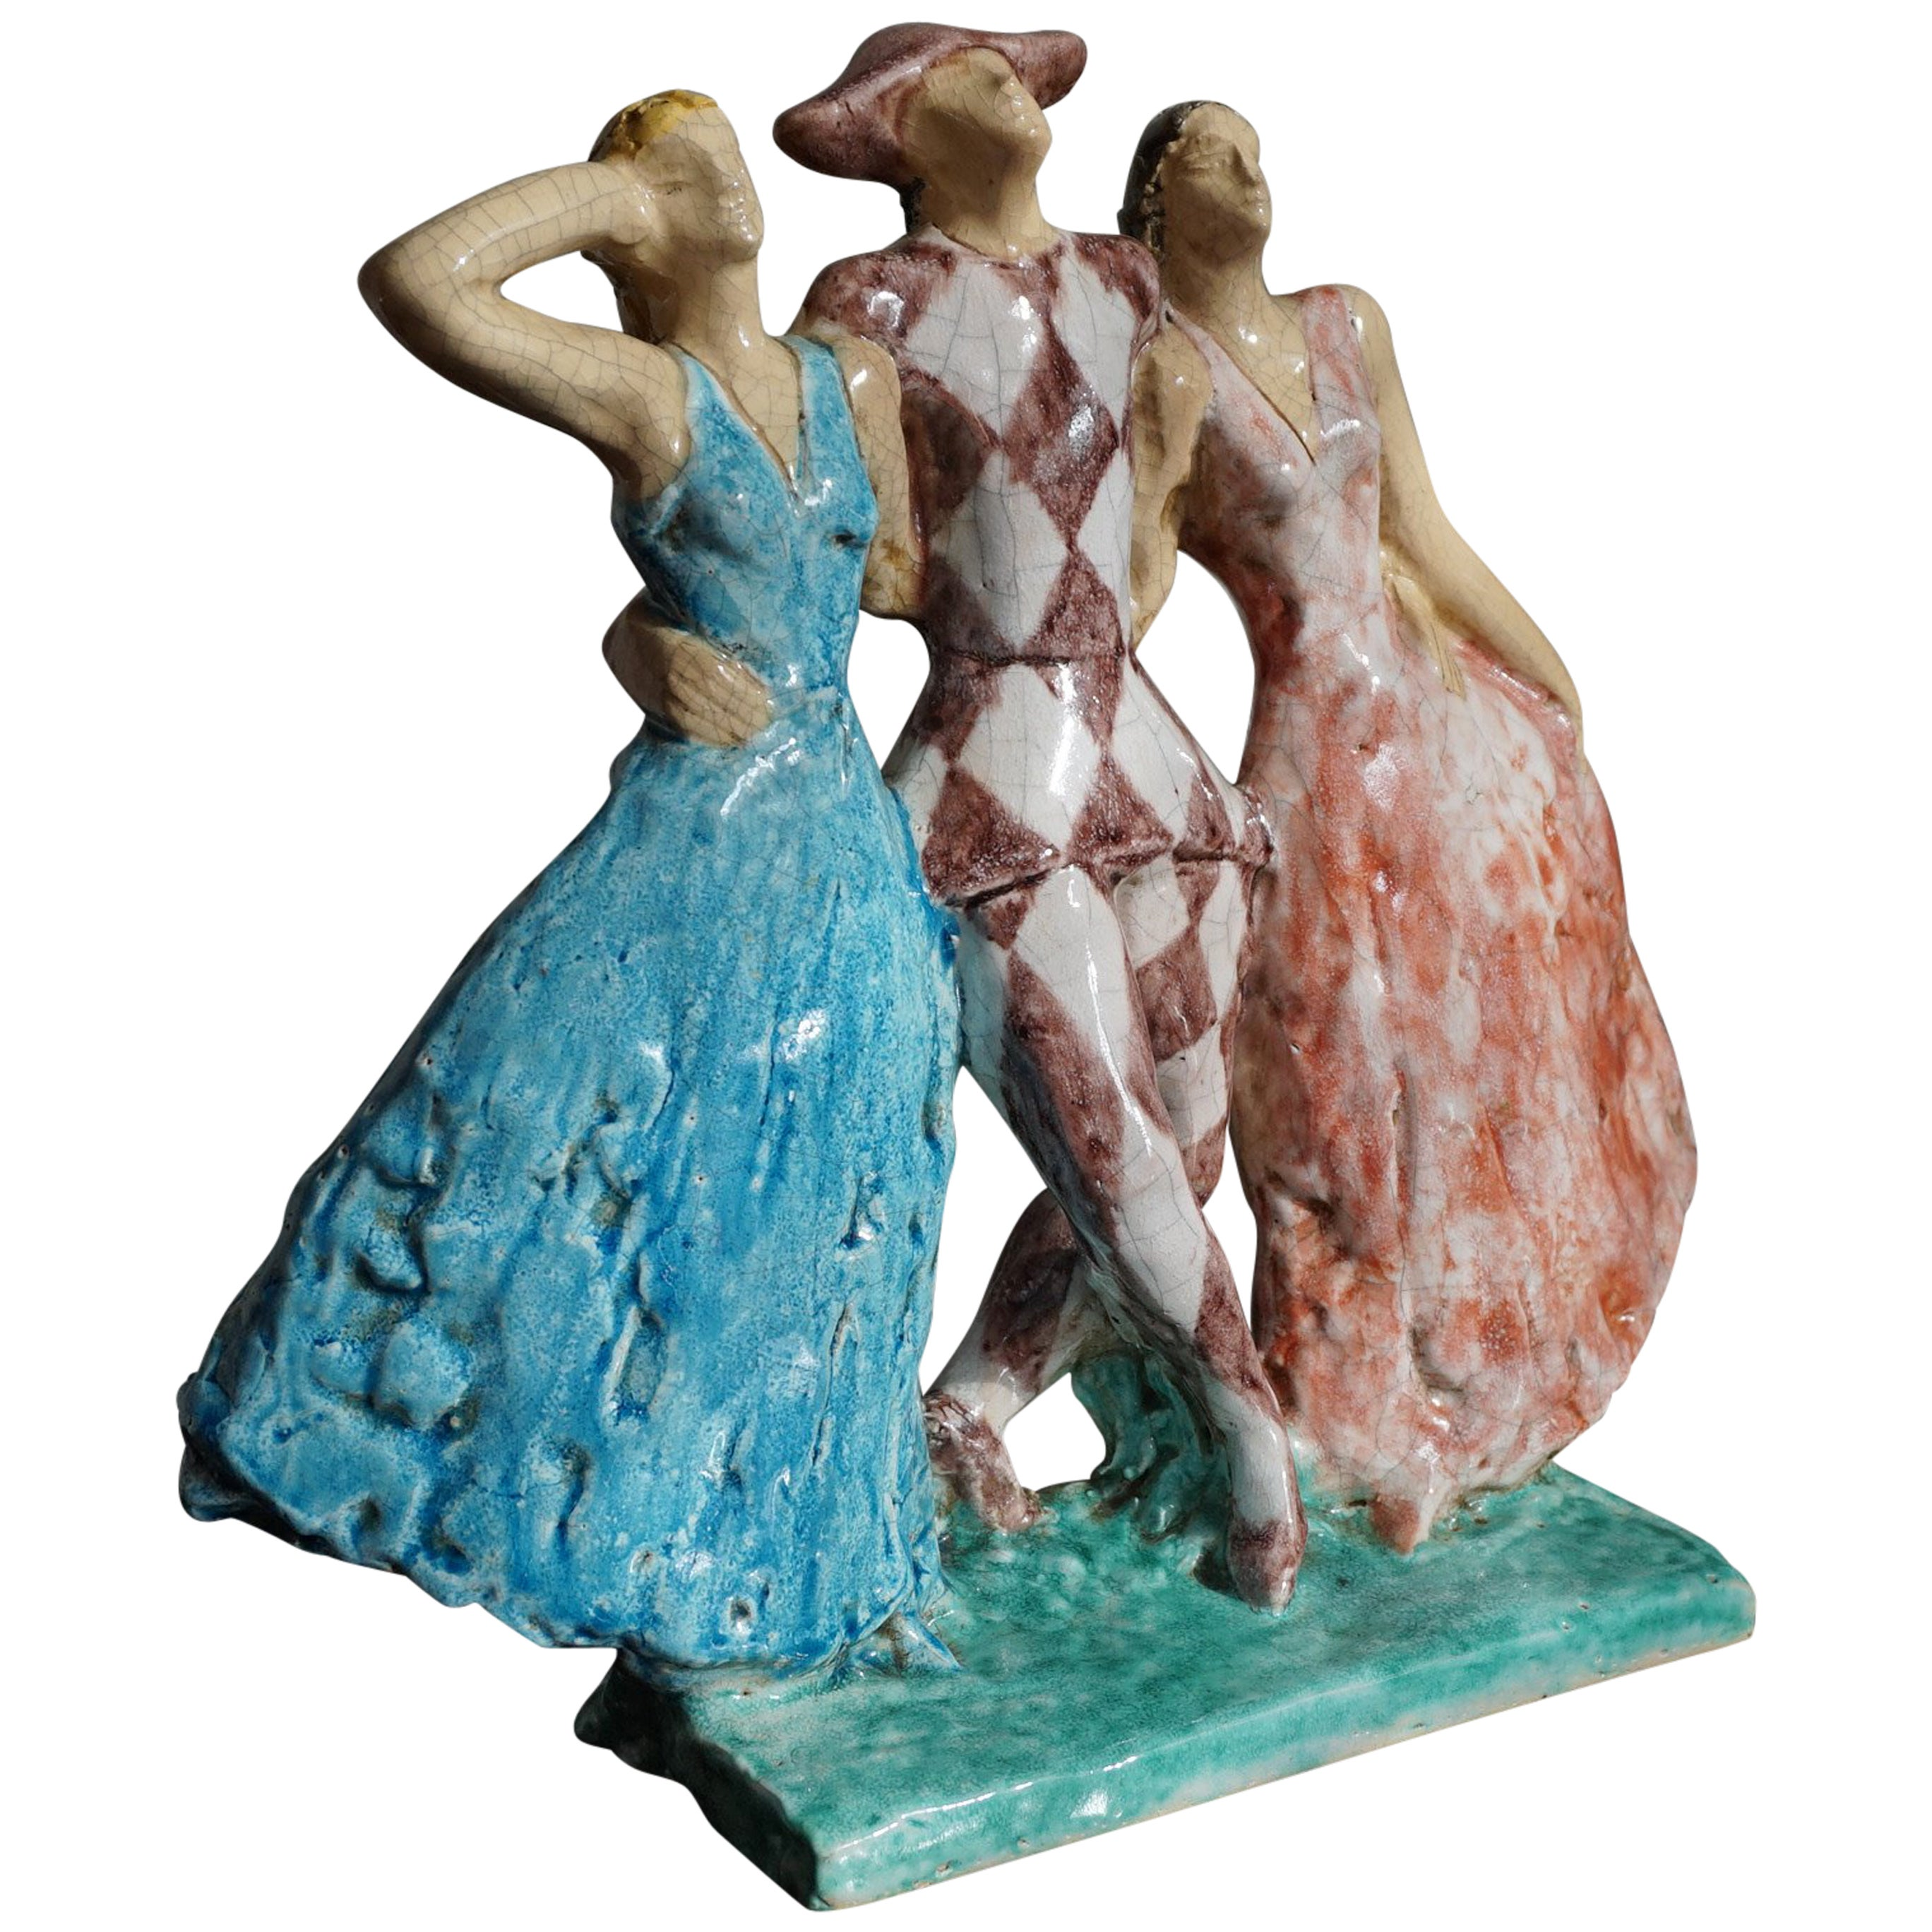 Rare French Art Deco Harlequin & Columbines Ceramic Sculpture by Edouard Cazaux